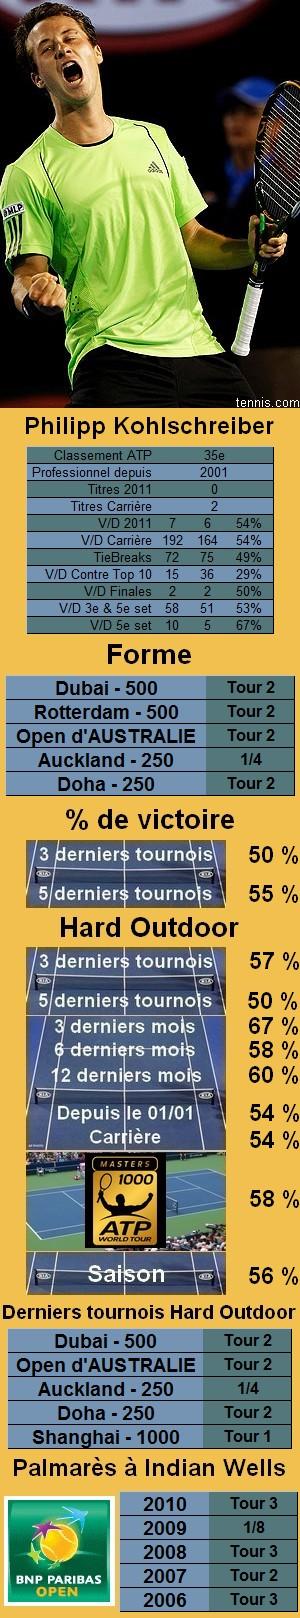 Les statistiques tennis de Philipp Kohlschreiber